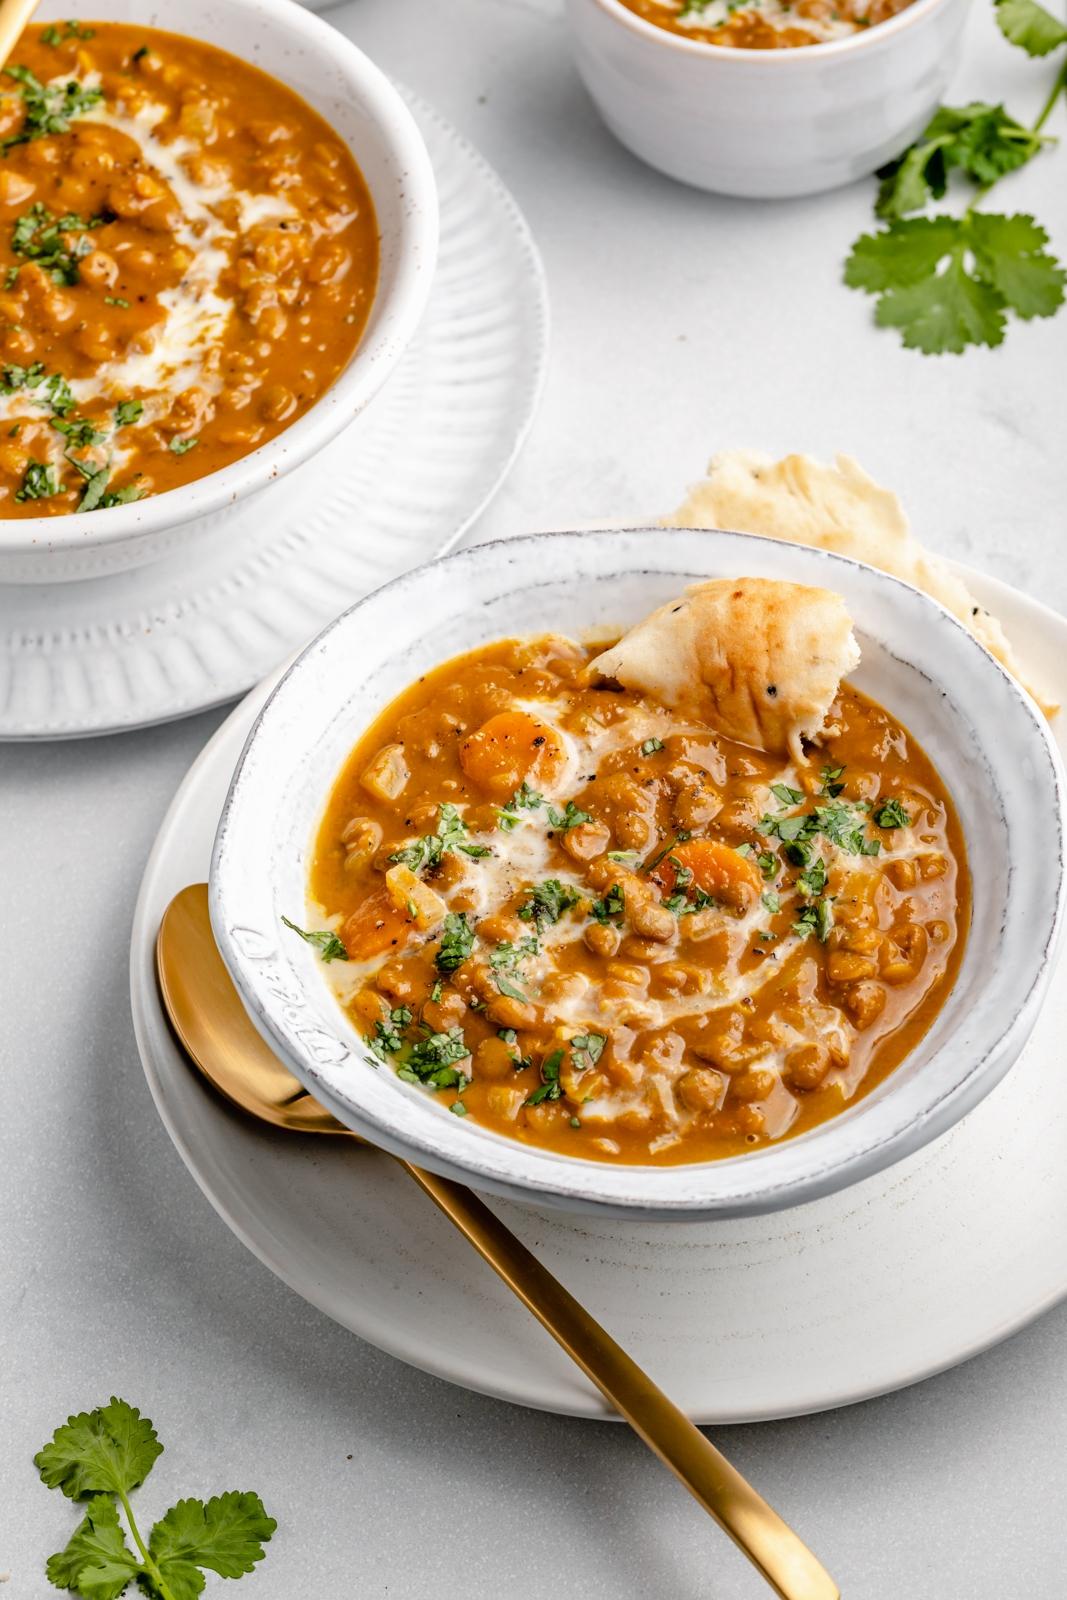 vegan pumpkin lentil soup in a bowl with pita bread